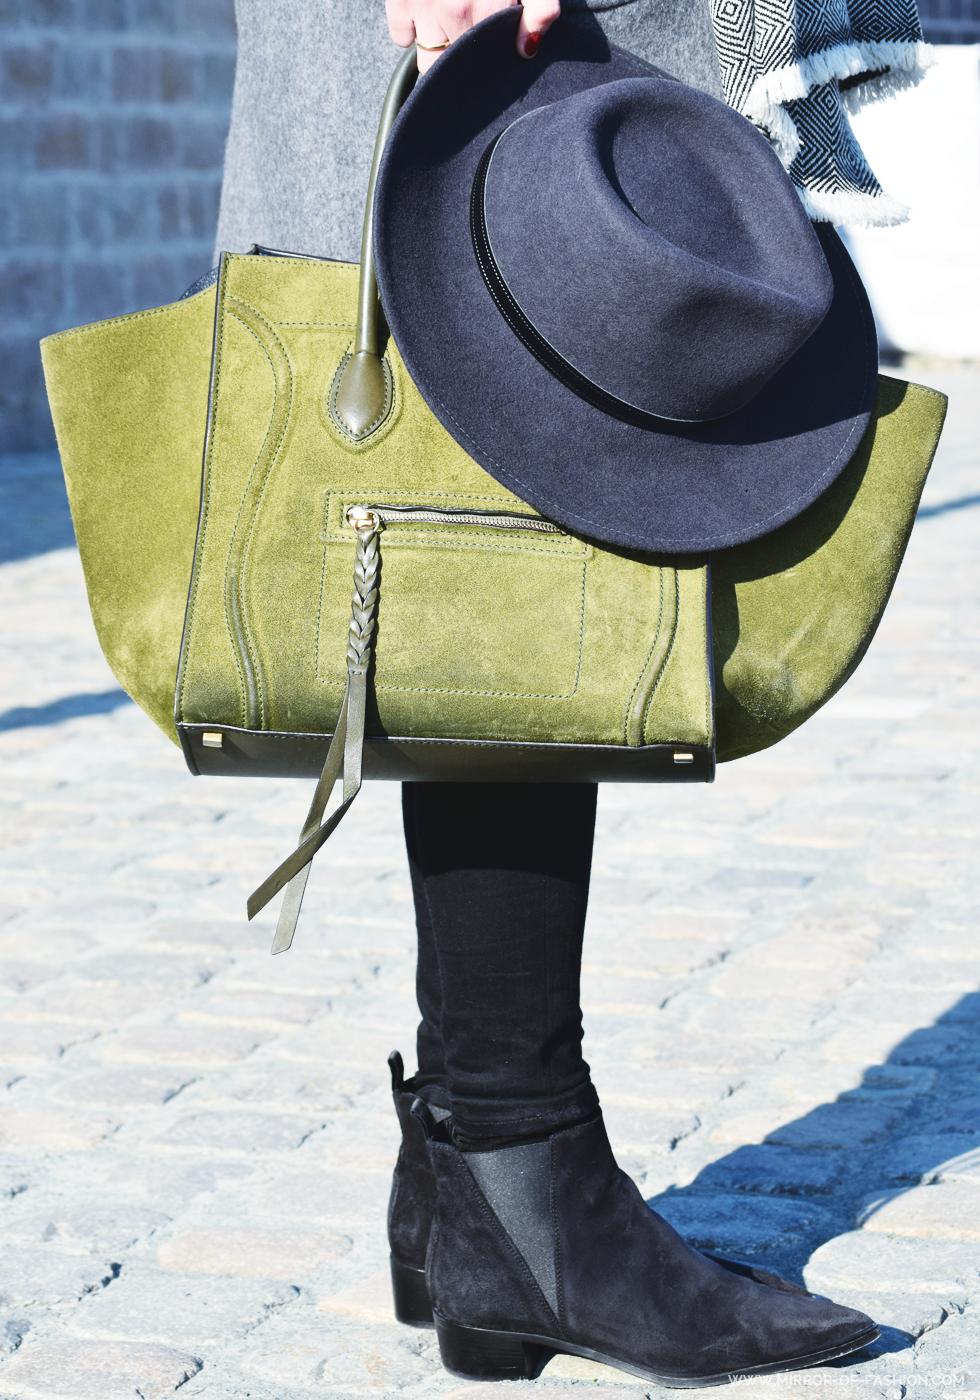 Outfit of the day, Herman Headwear, Acne Studios, Jbrand, Céline, Daniel Wellington, s.Oliver, Mia Zia, Dior, ootd, style, fashion, blogger